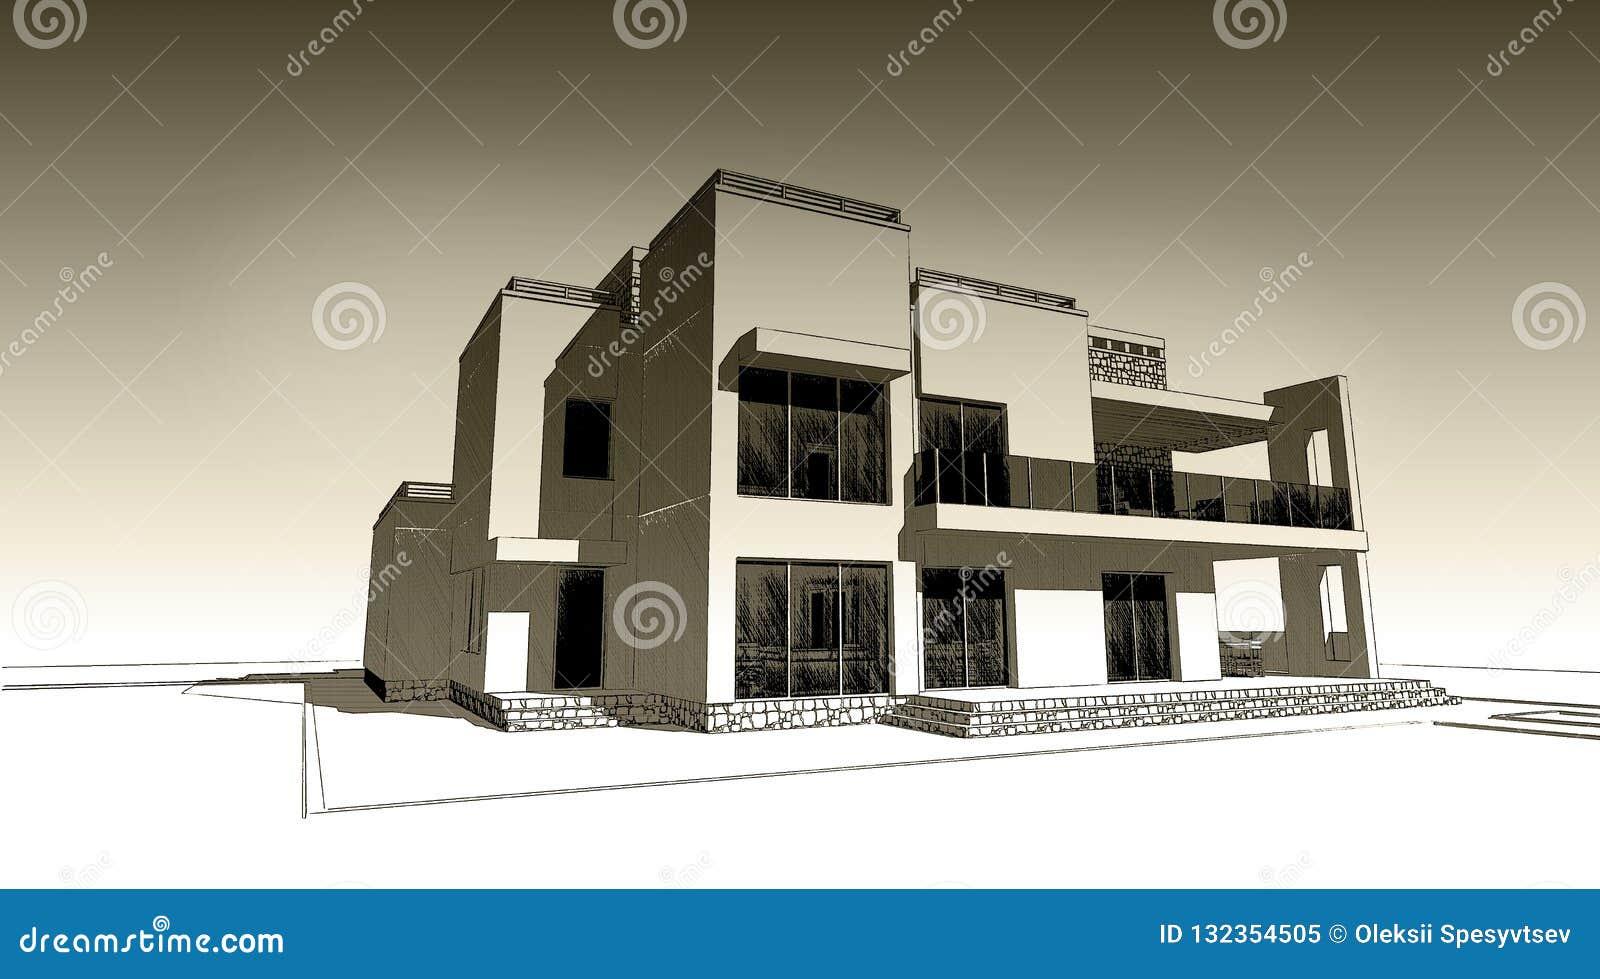 3d Pencil Sketch Illustration Of A Modern Building Exterior Facade